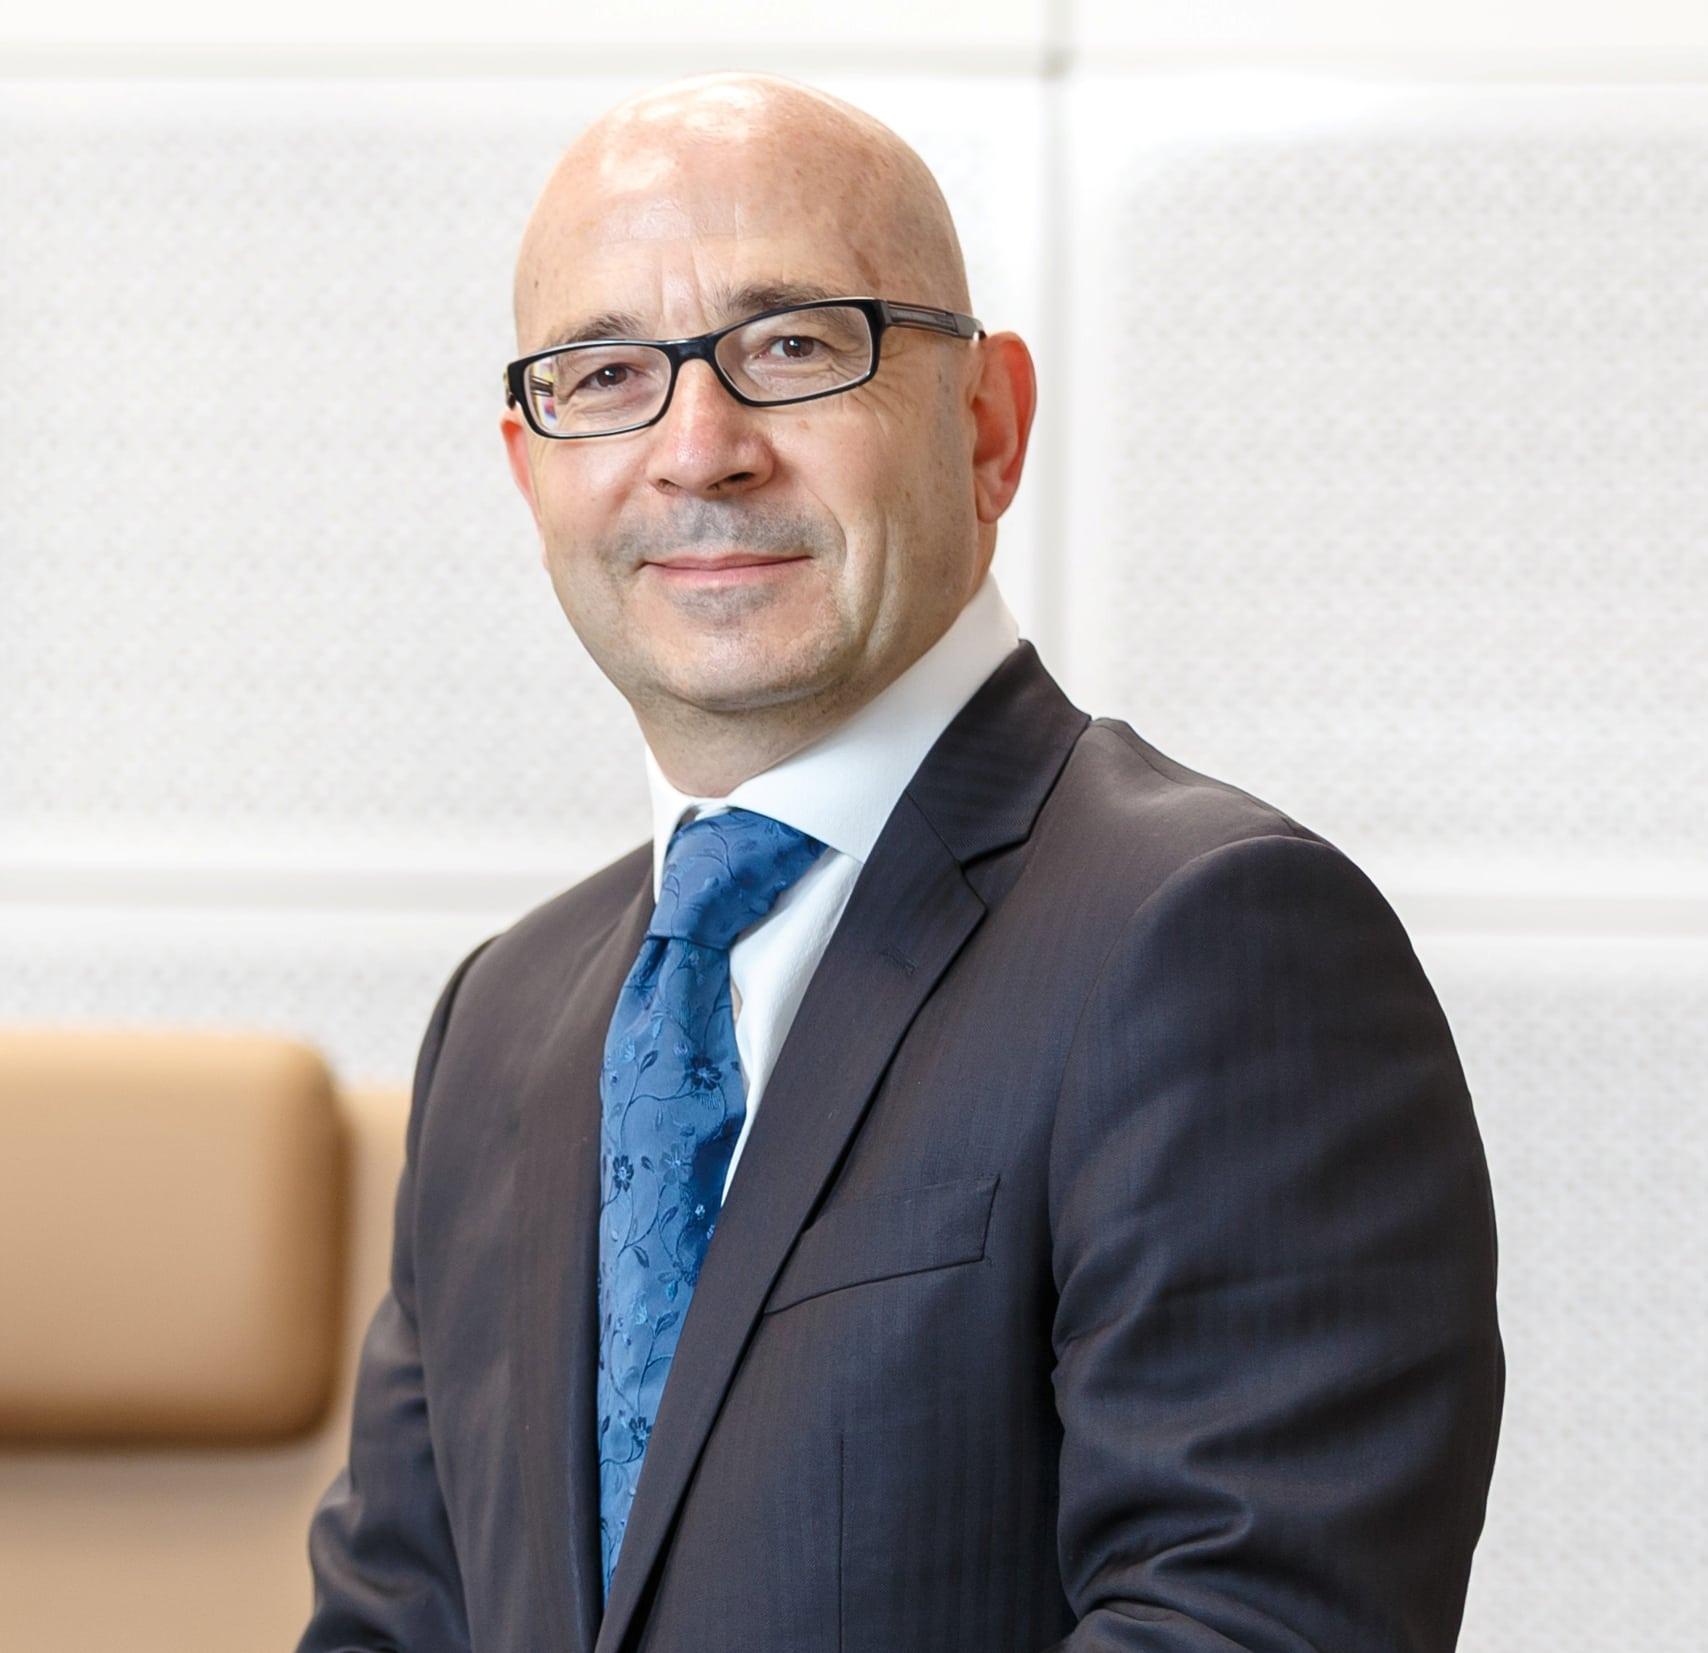 Philippe Garcet, CEO Societe Generale European Business Services